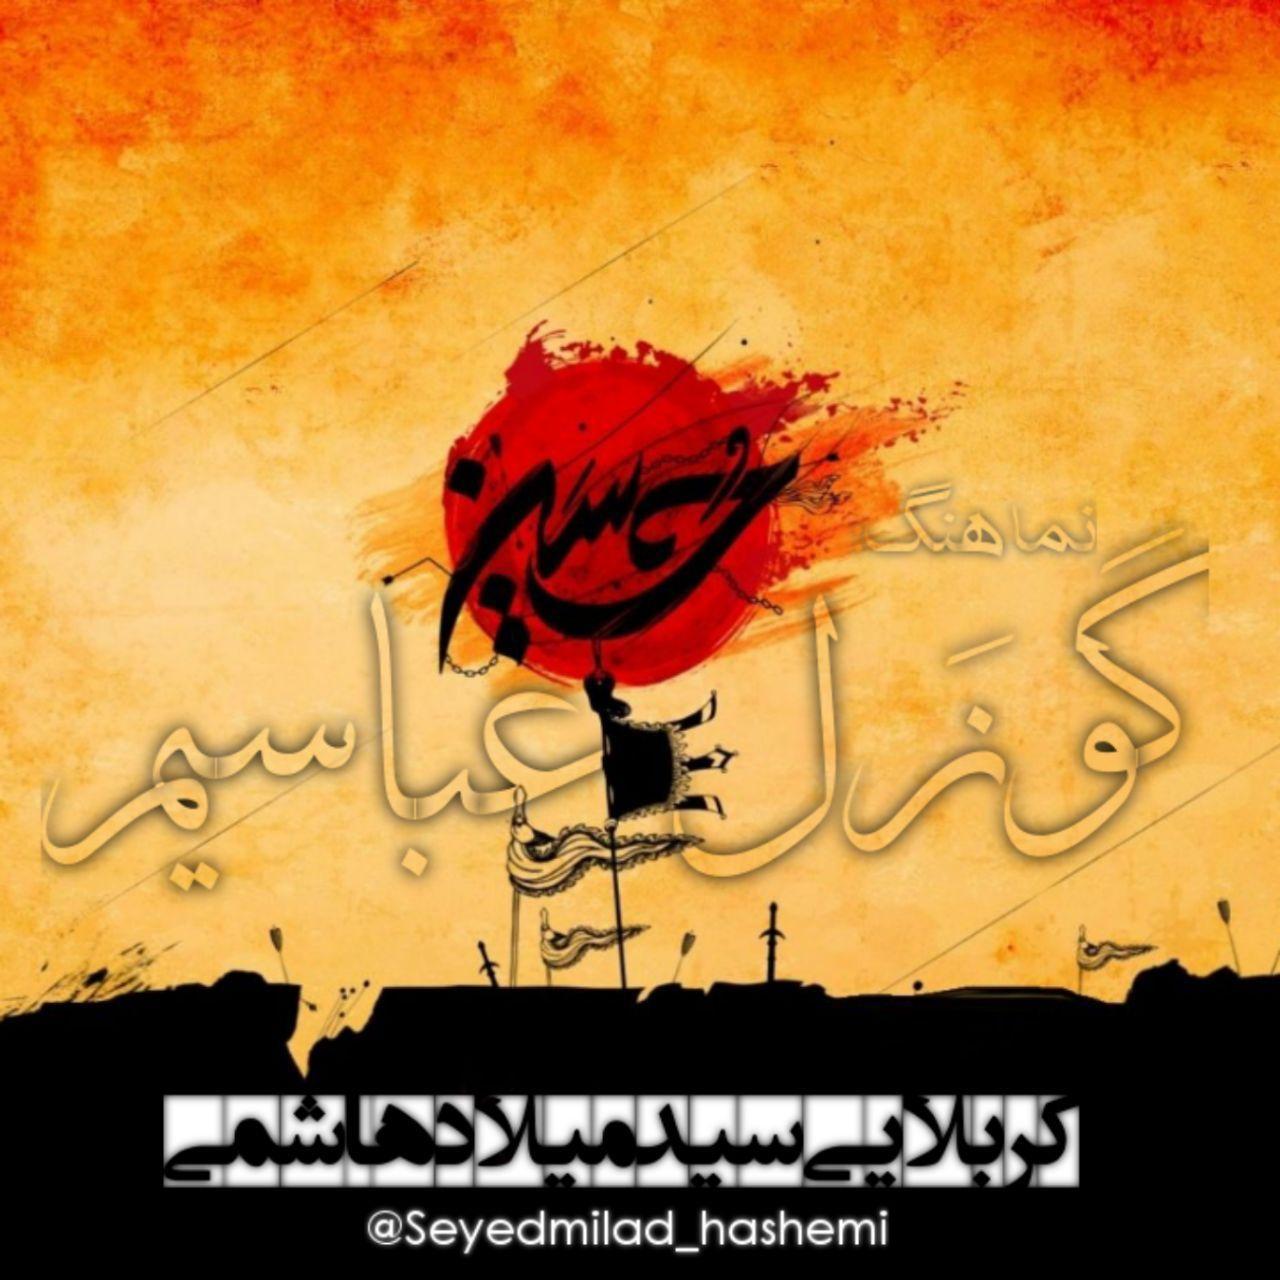 http://s11.picofile.com/file/8407272776/17Seyed_Milad_Hashemi_Gozal_Abbasim.jpg